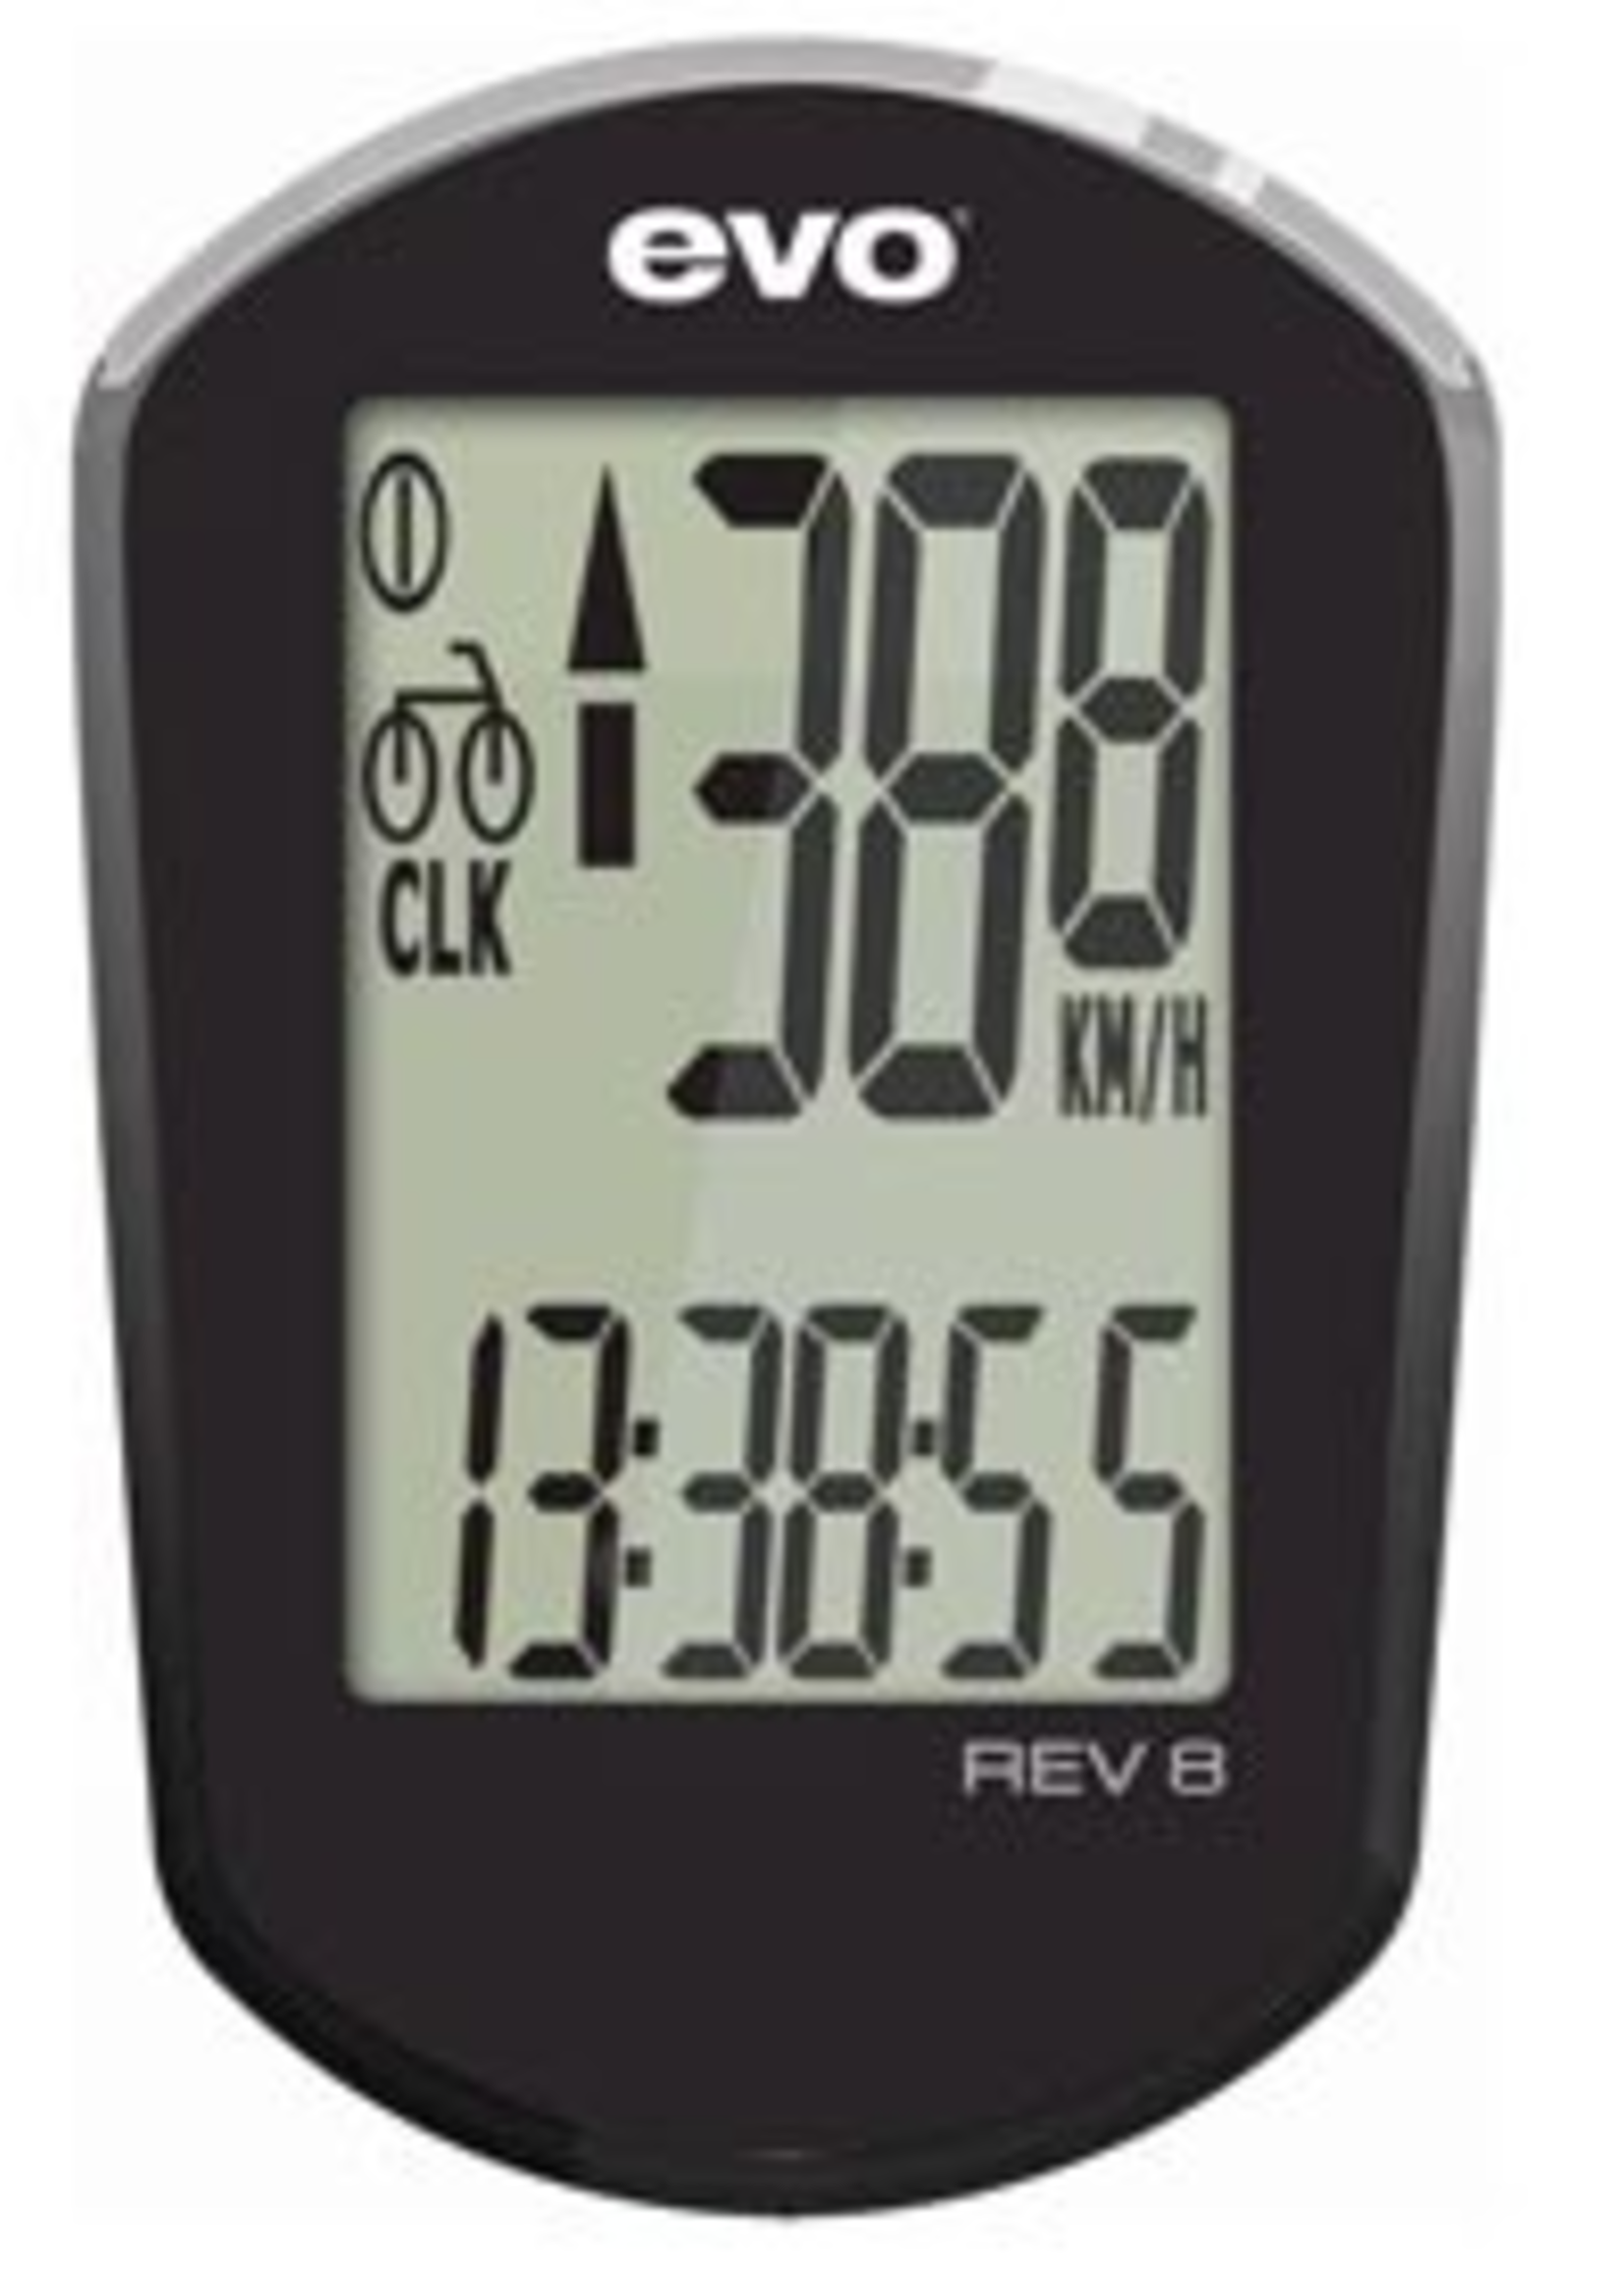 EVO REV 8 WIRED CYCLO COMPUTER BLACK